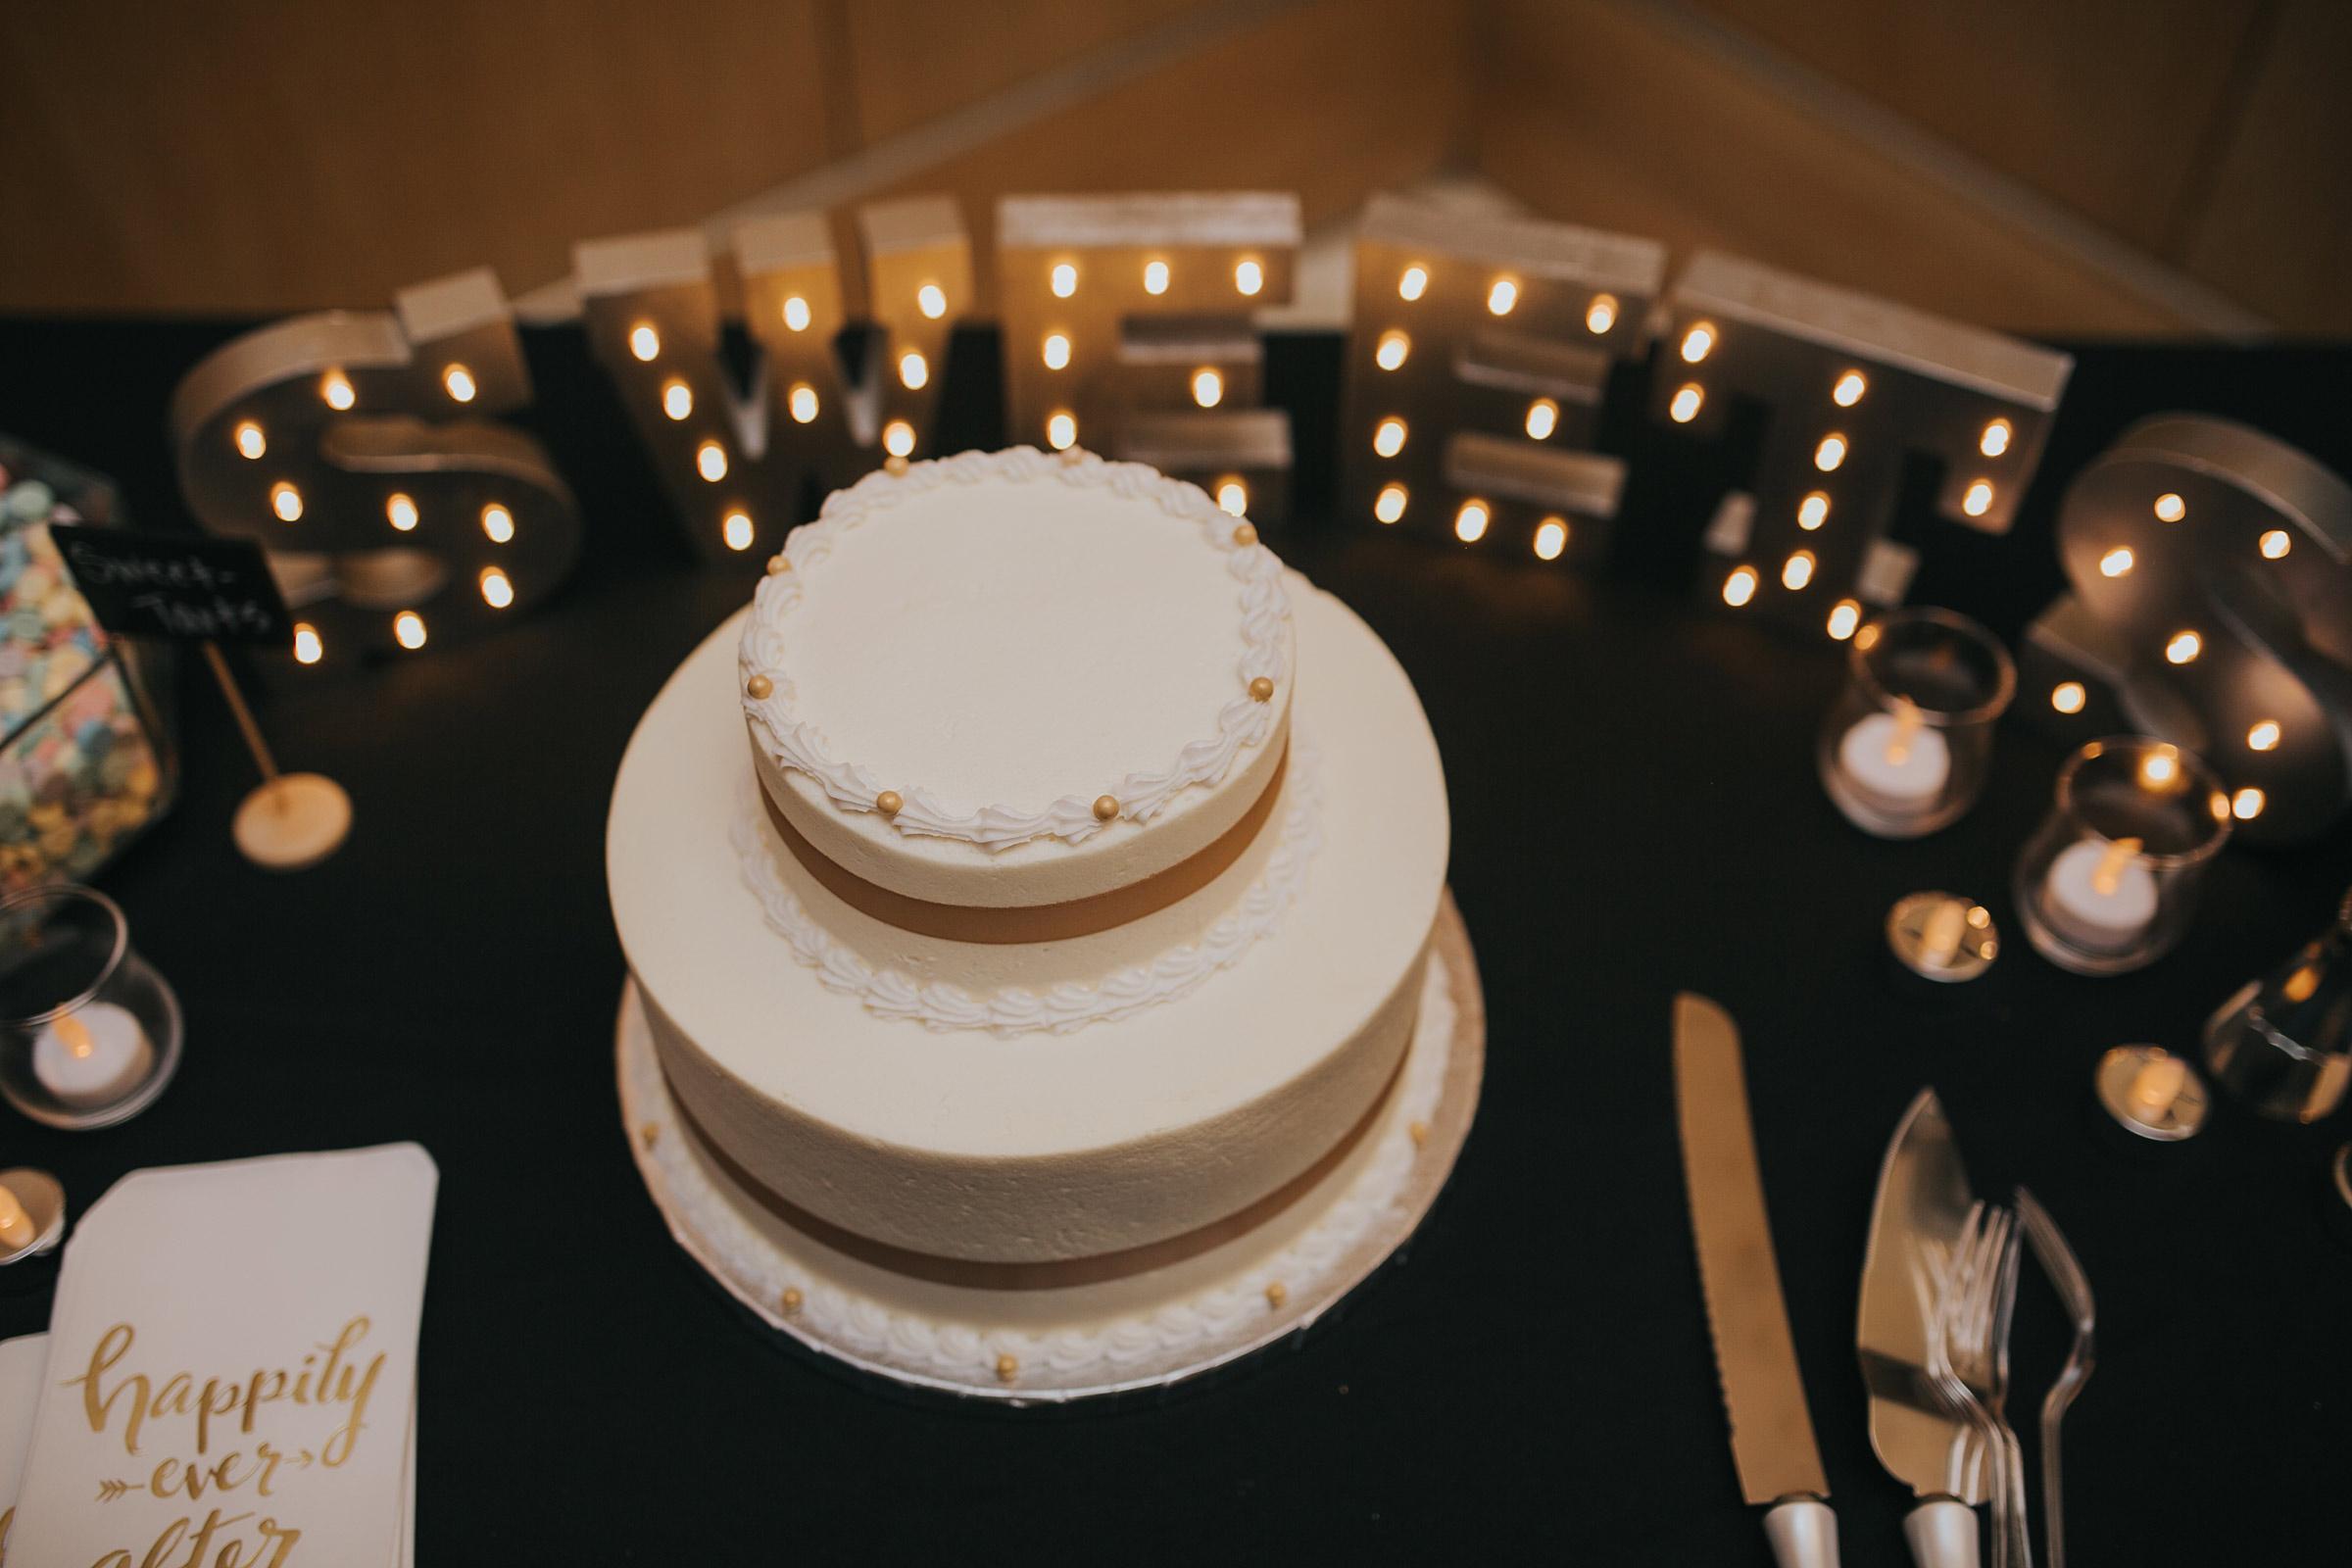 sweets-bar-with-cake-desmoines-iowa-art-center-raelyn-ramey-photography.jpg